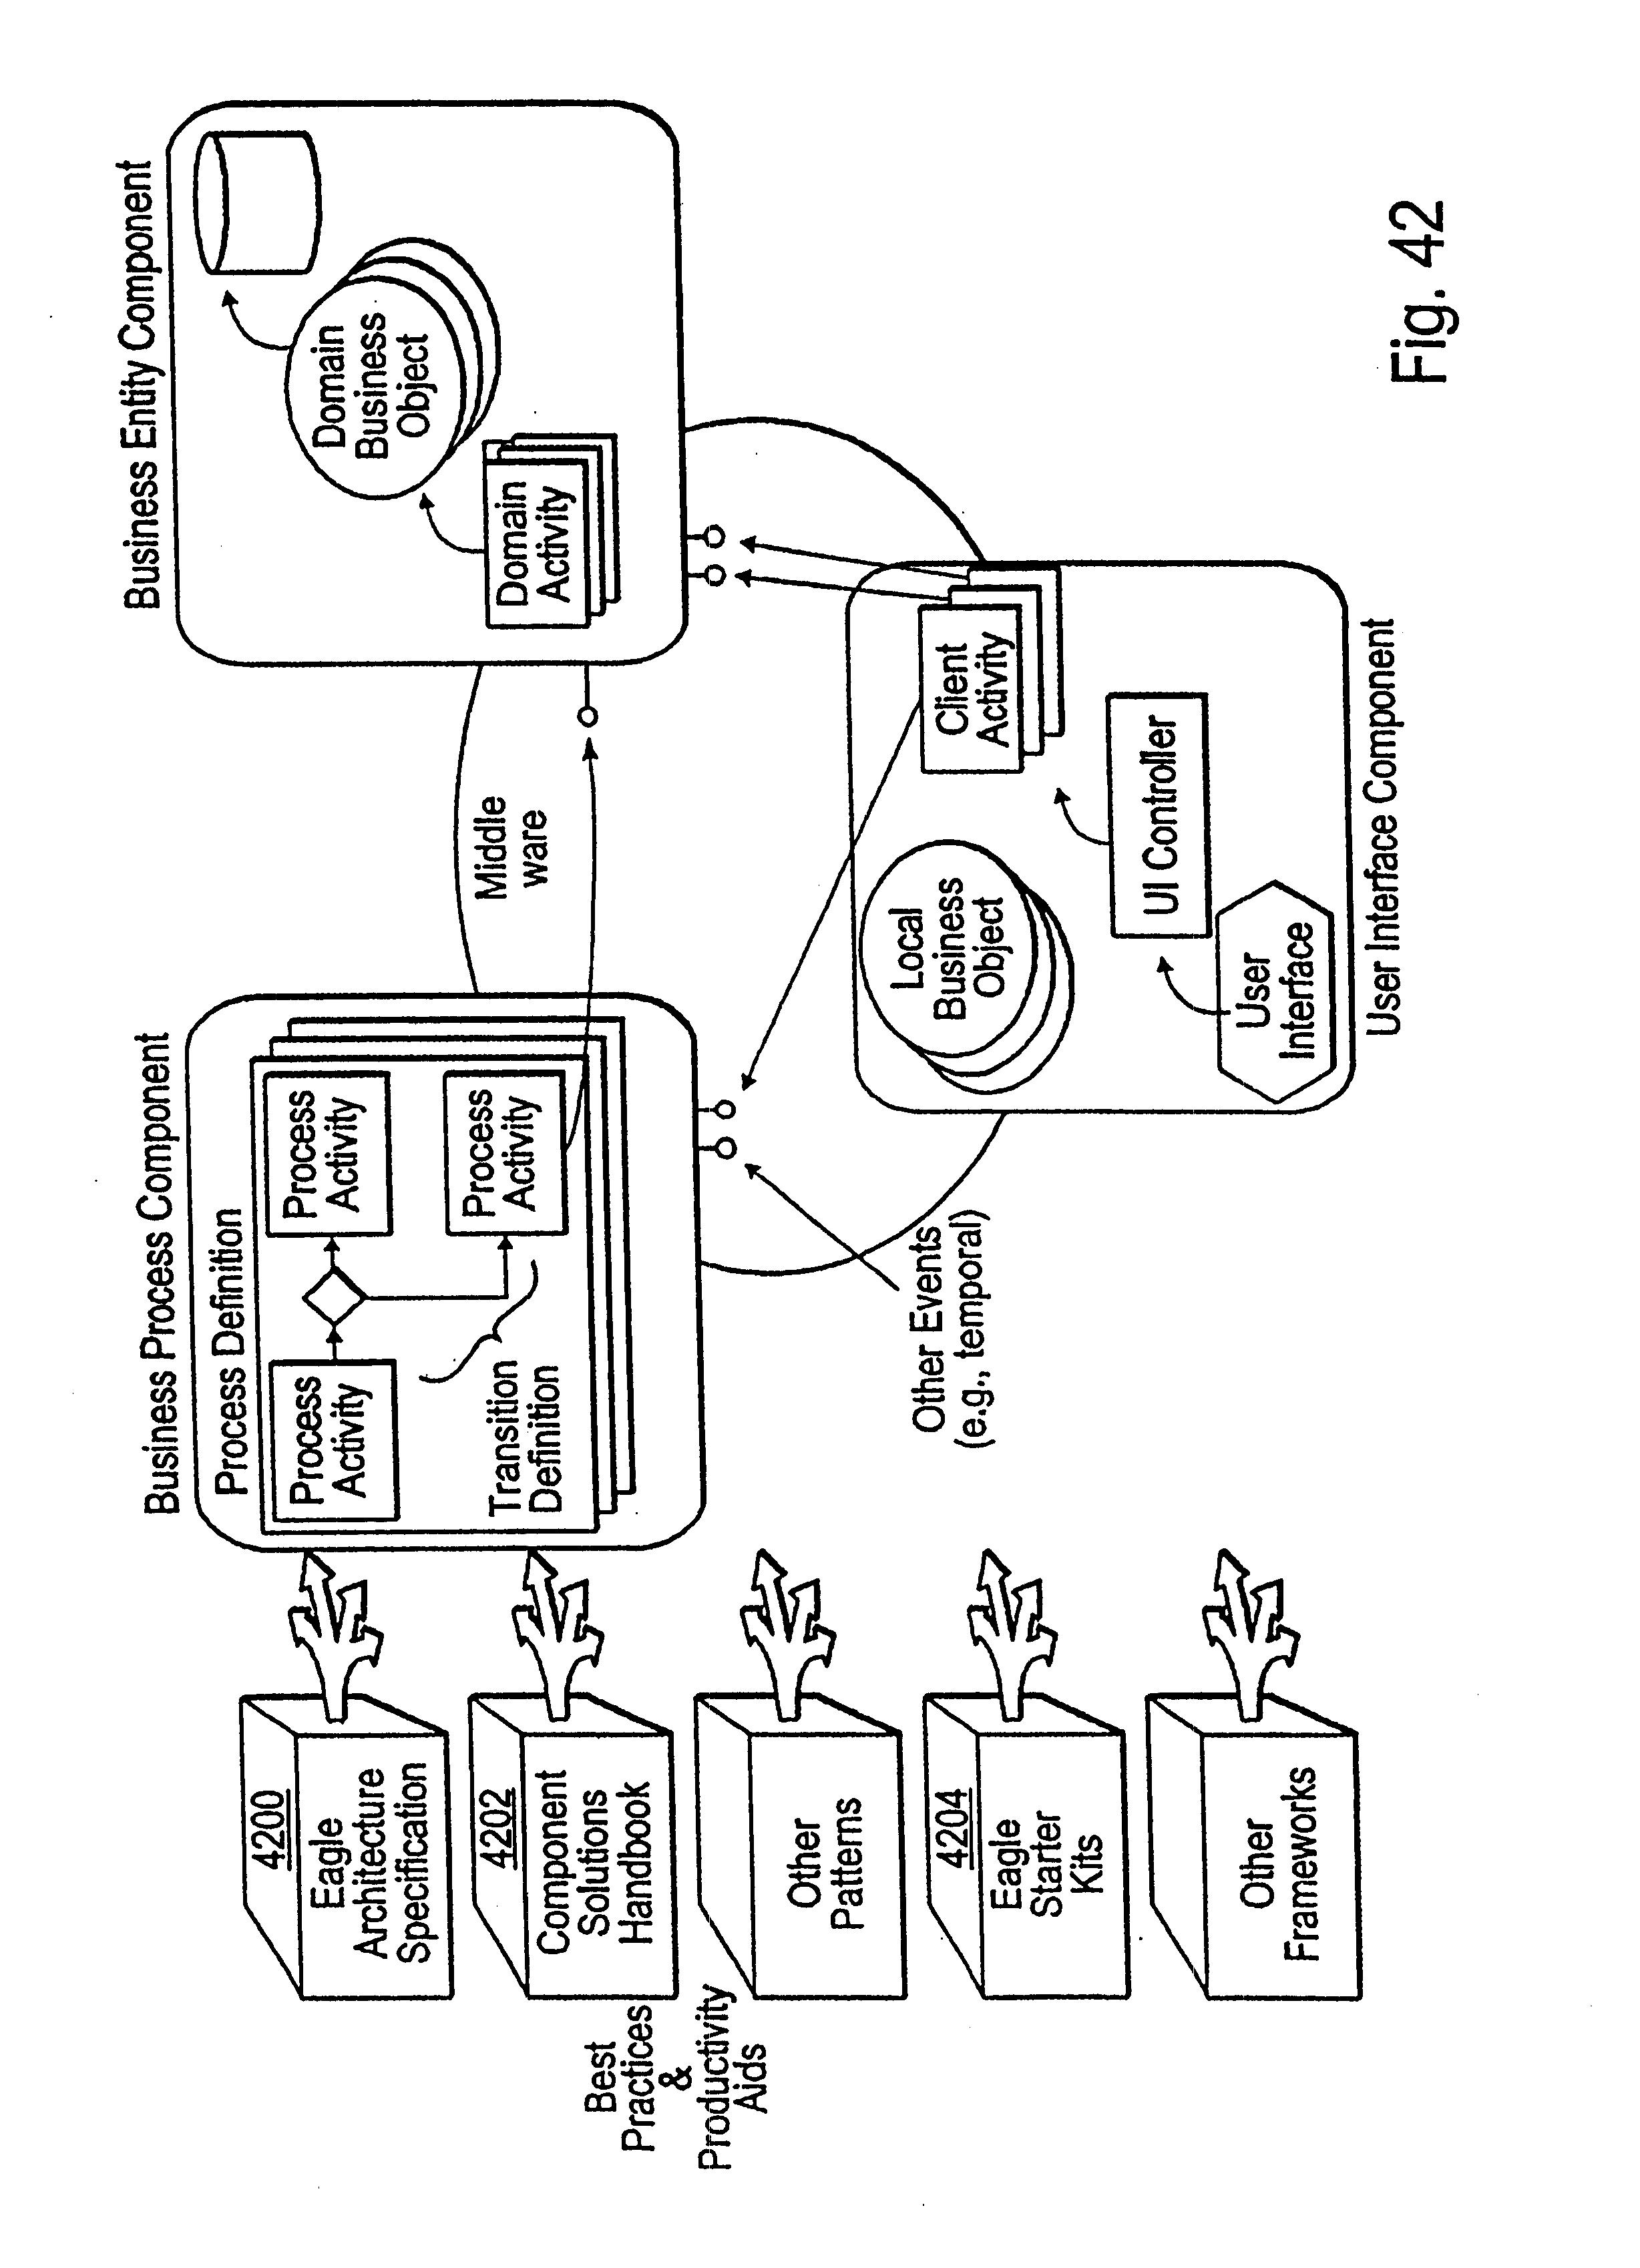 DIAGRAM] Wiring Viper Diagram Alarm Car 560vx FULL Version HD Quality Car  560vx - POTWIRING.AUDREYPASSIONS.FRPortal Diagram Database